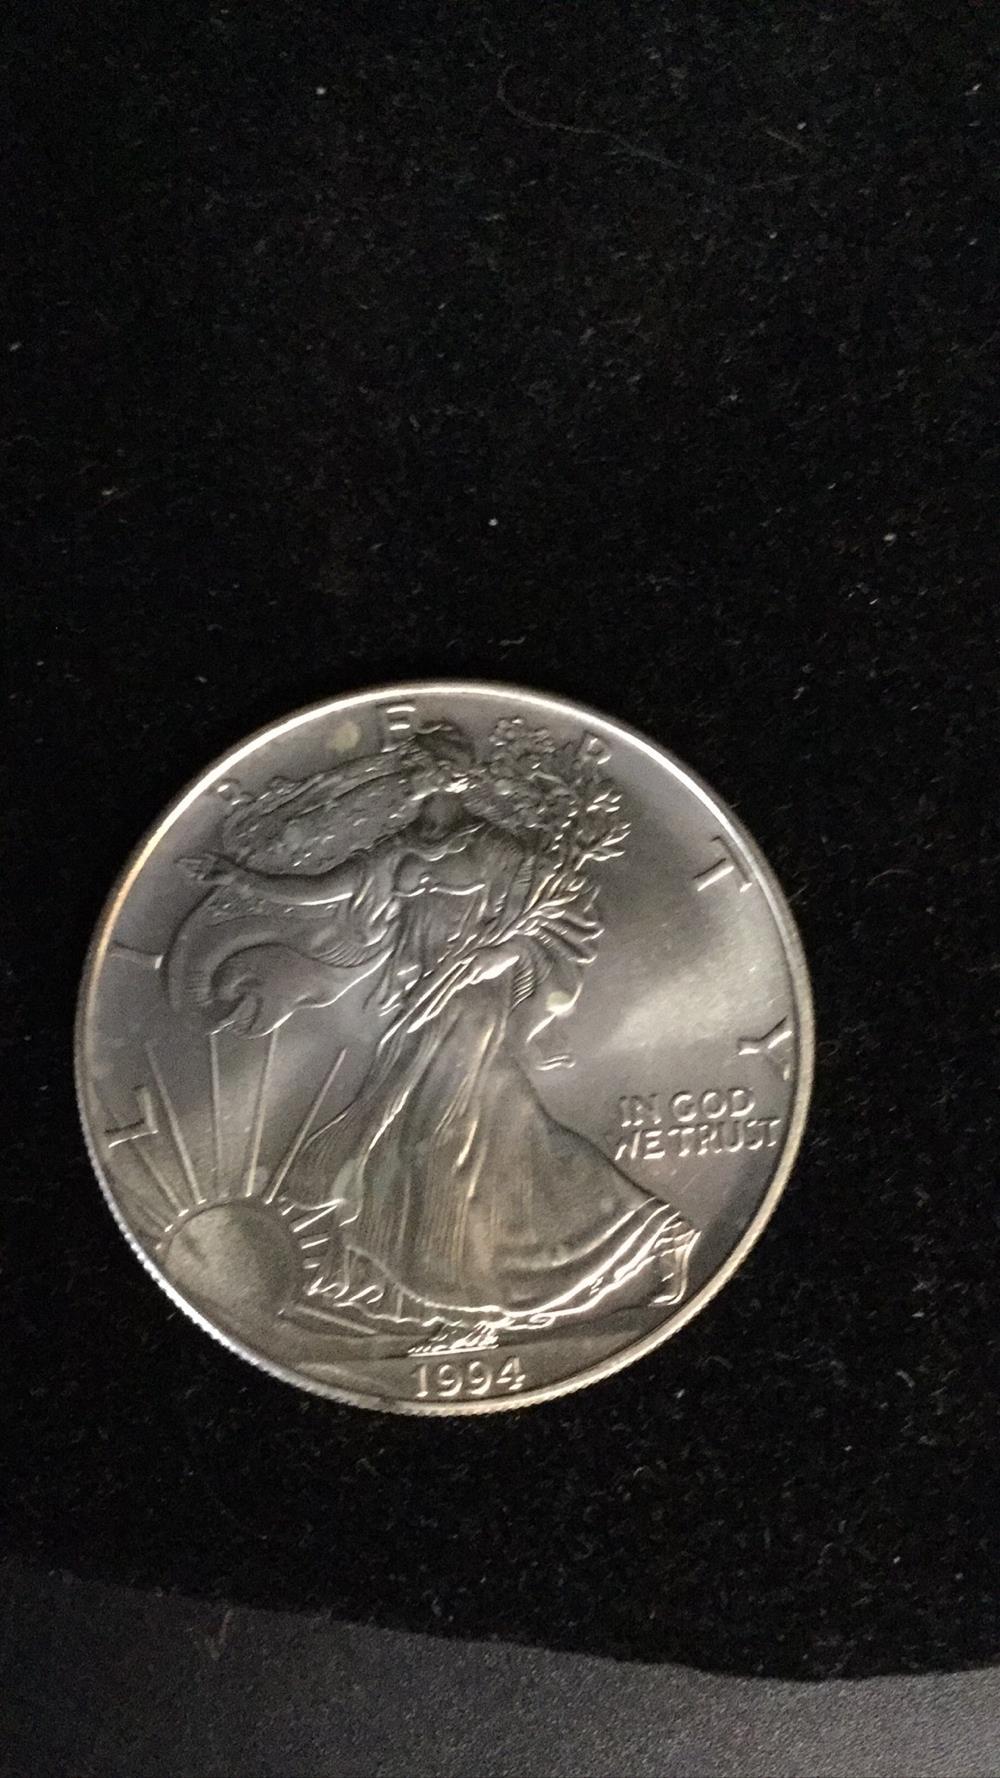 1994 American eagle